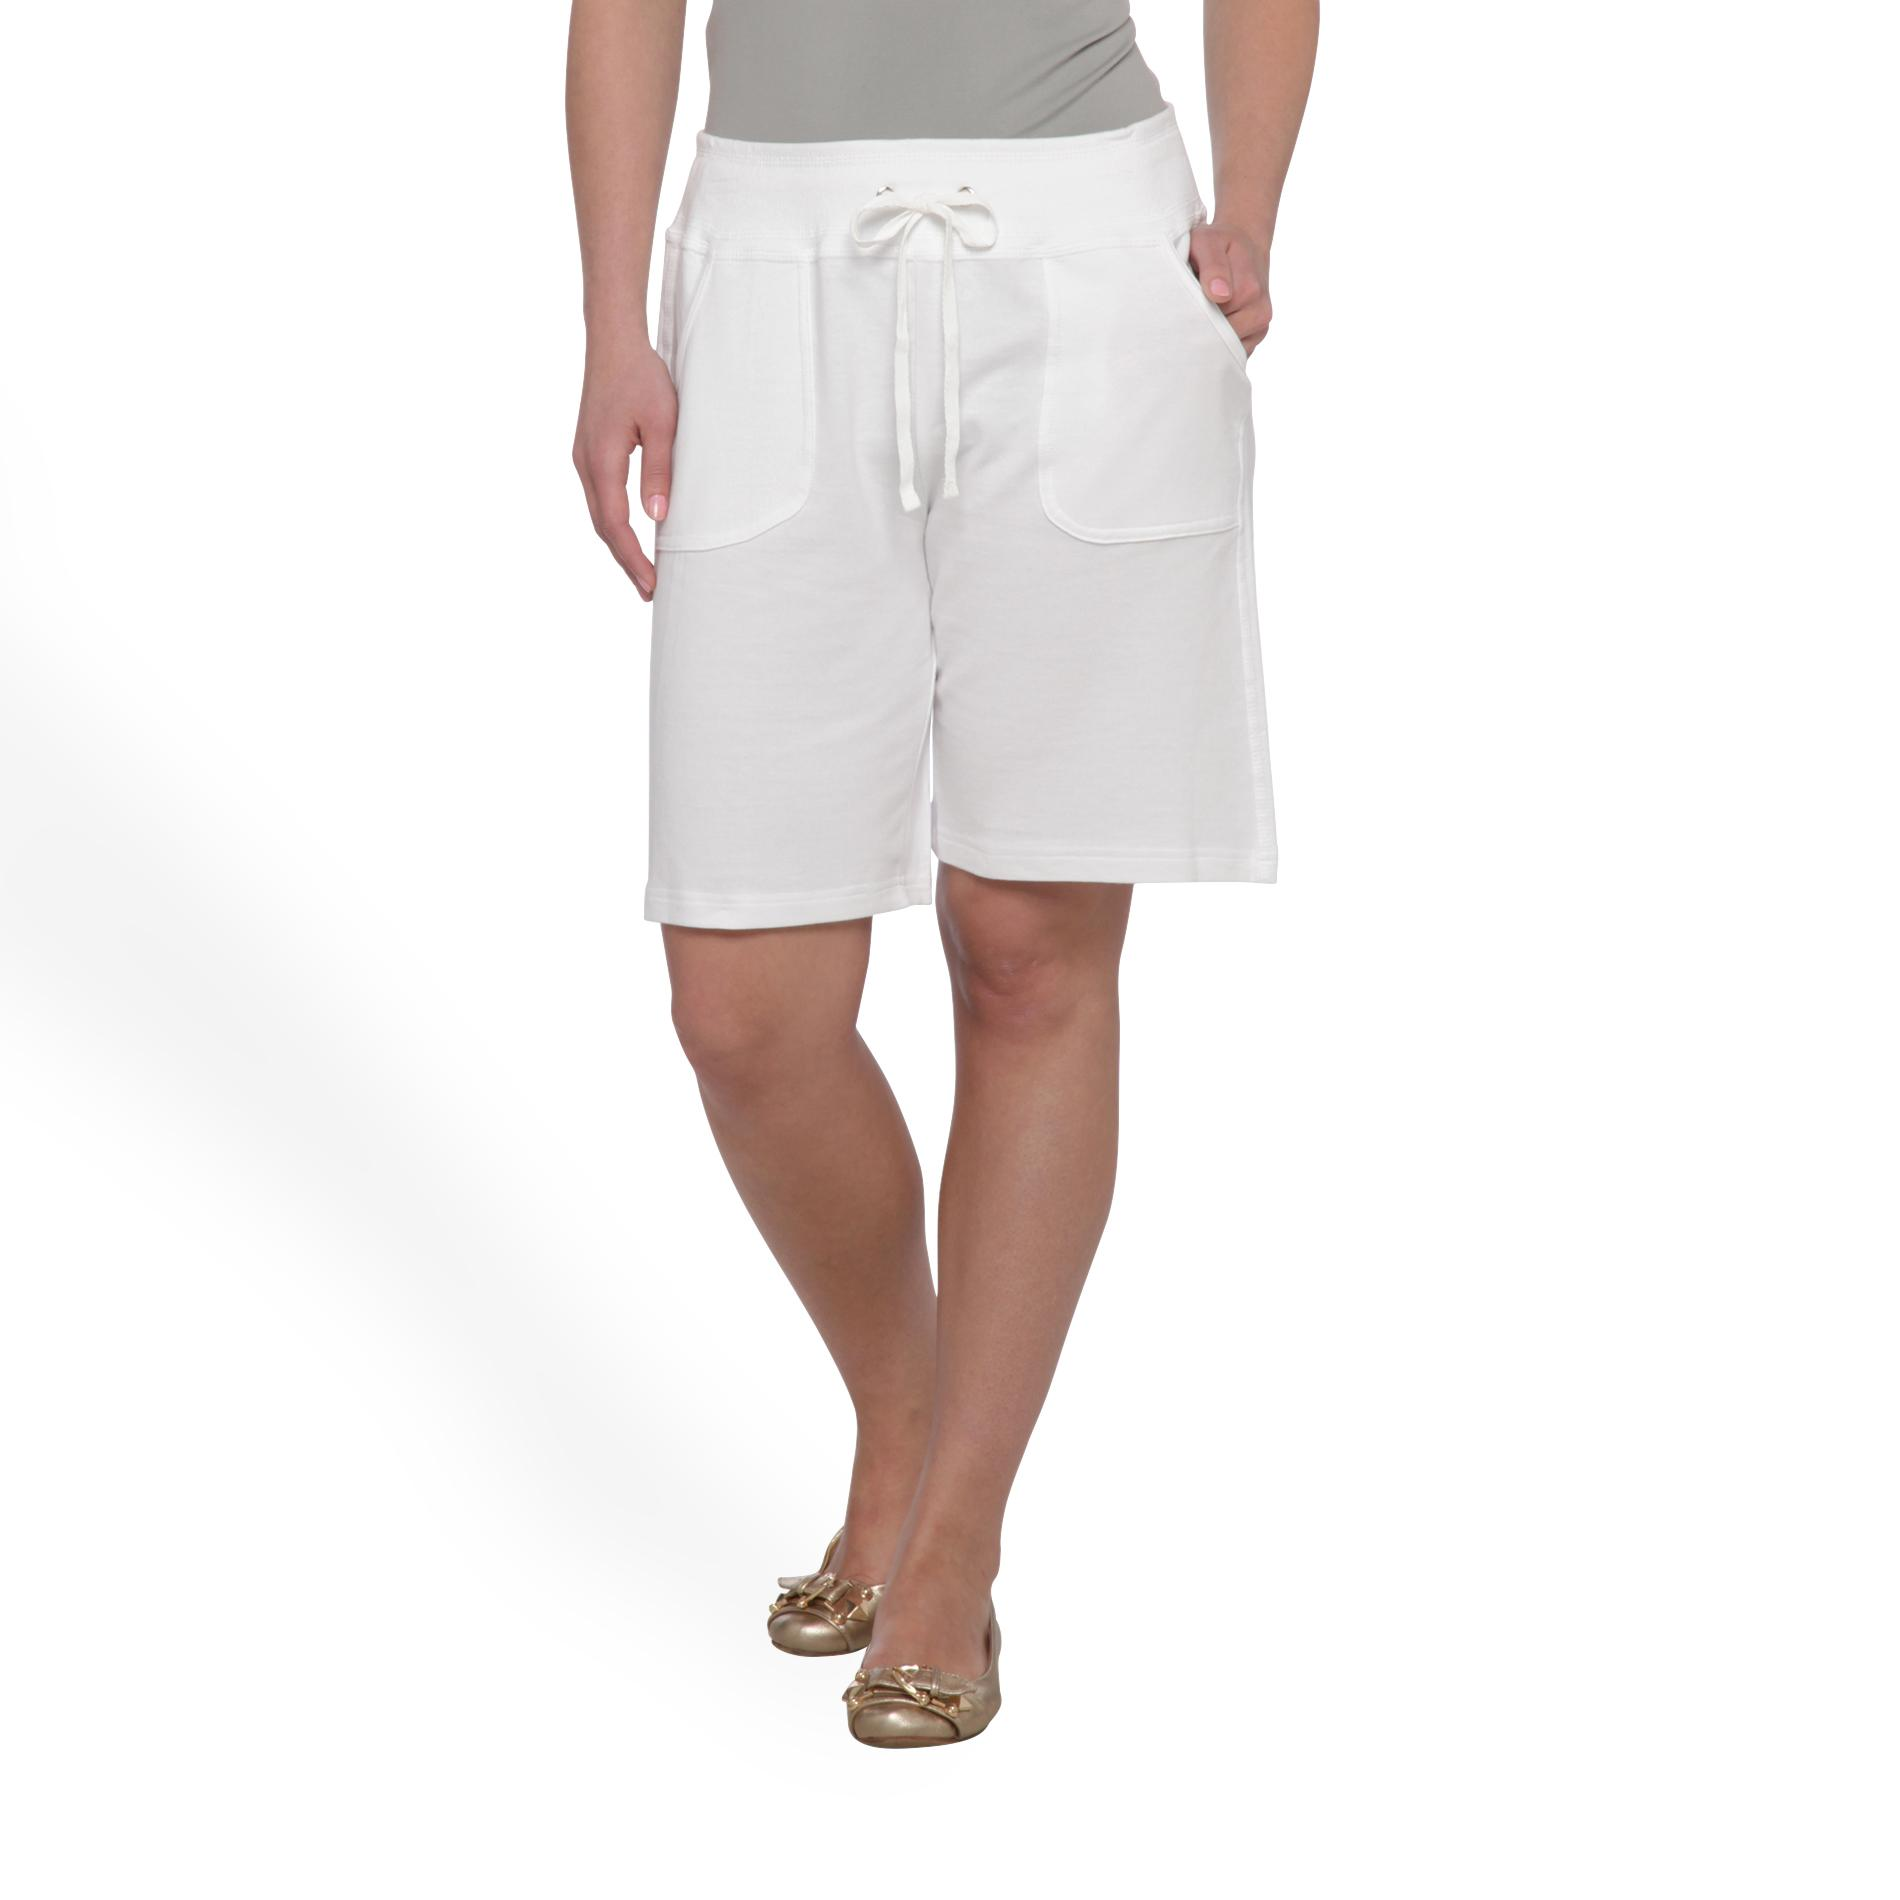 Athletech Women's Knit Shorts at Kmart.com